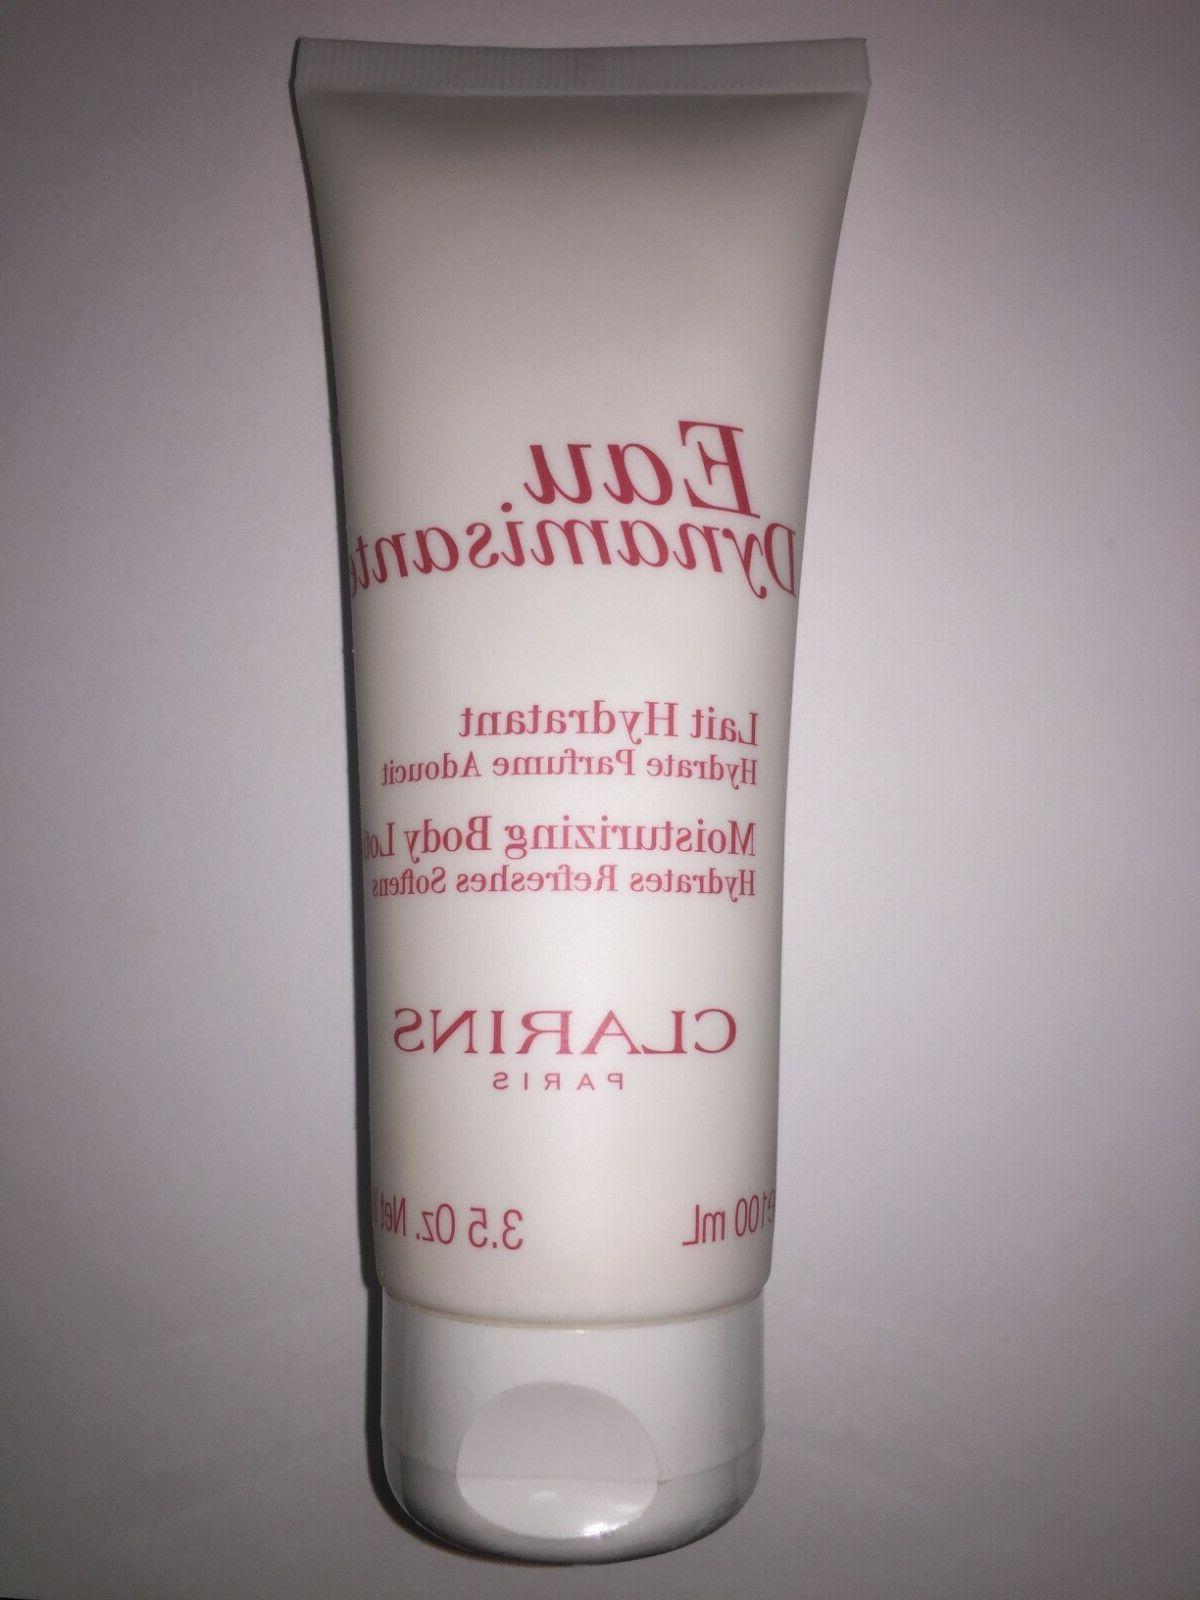 eau dynamisante moisturizing body lotion 3 5oz